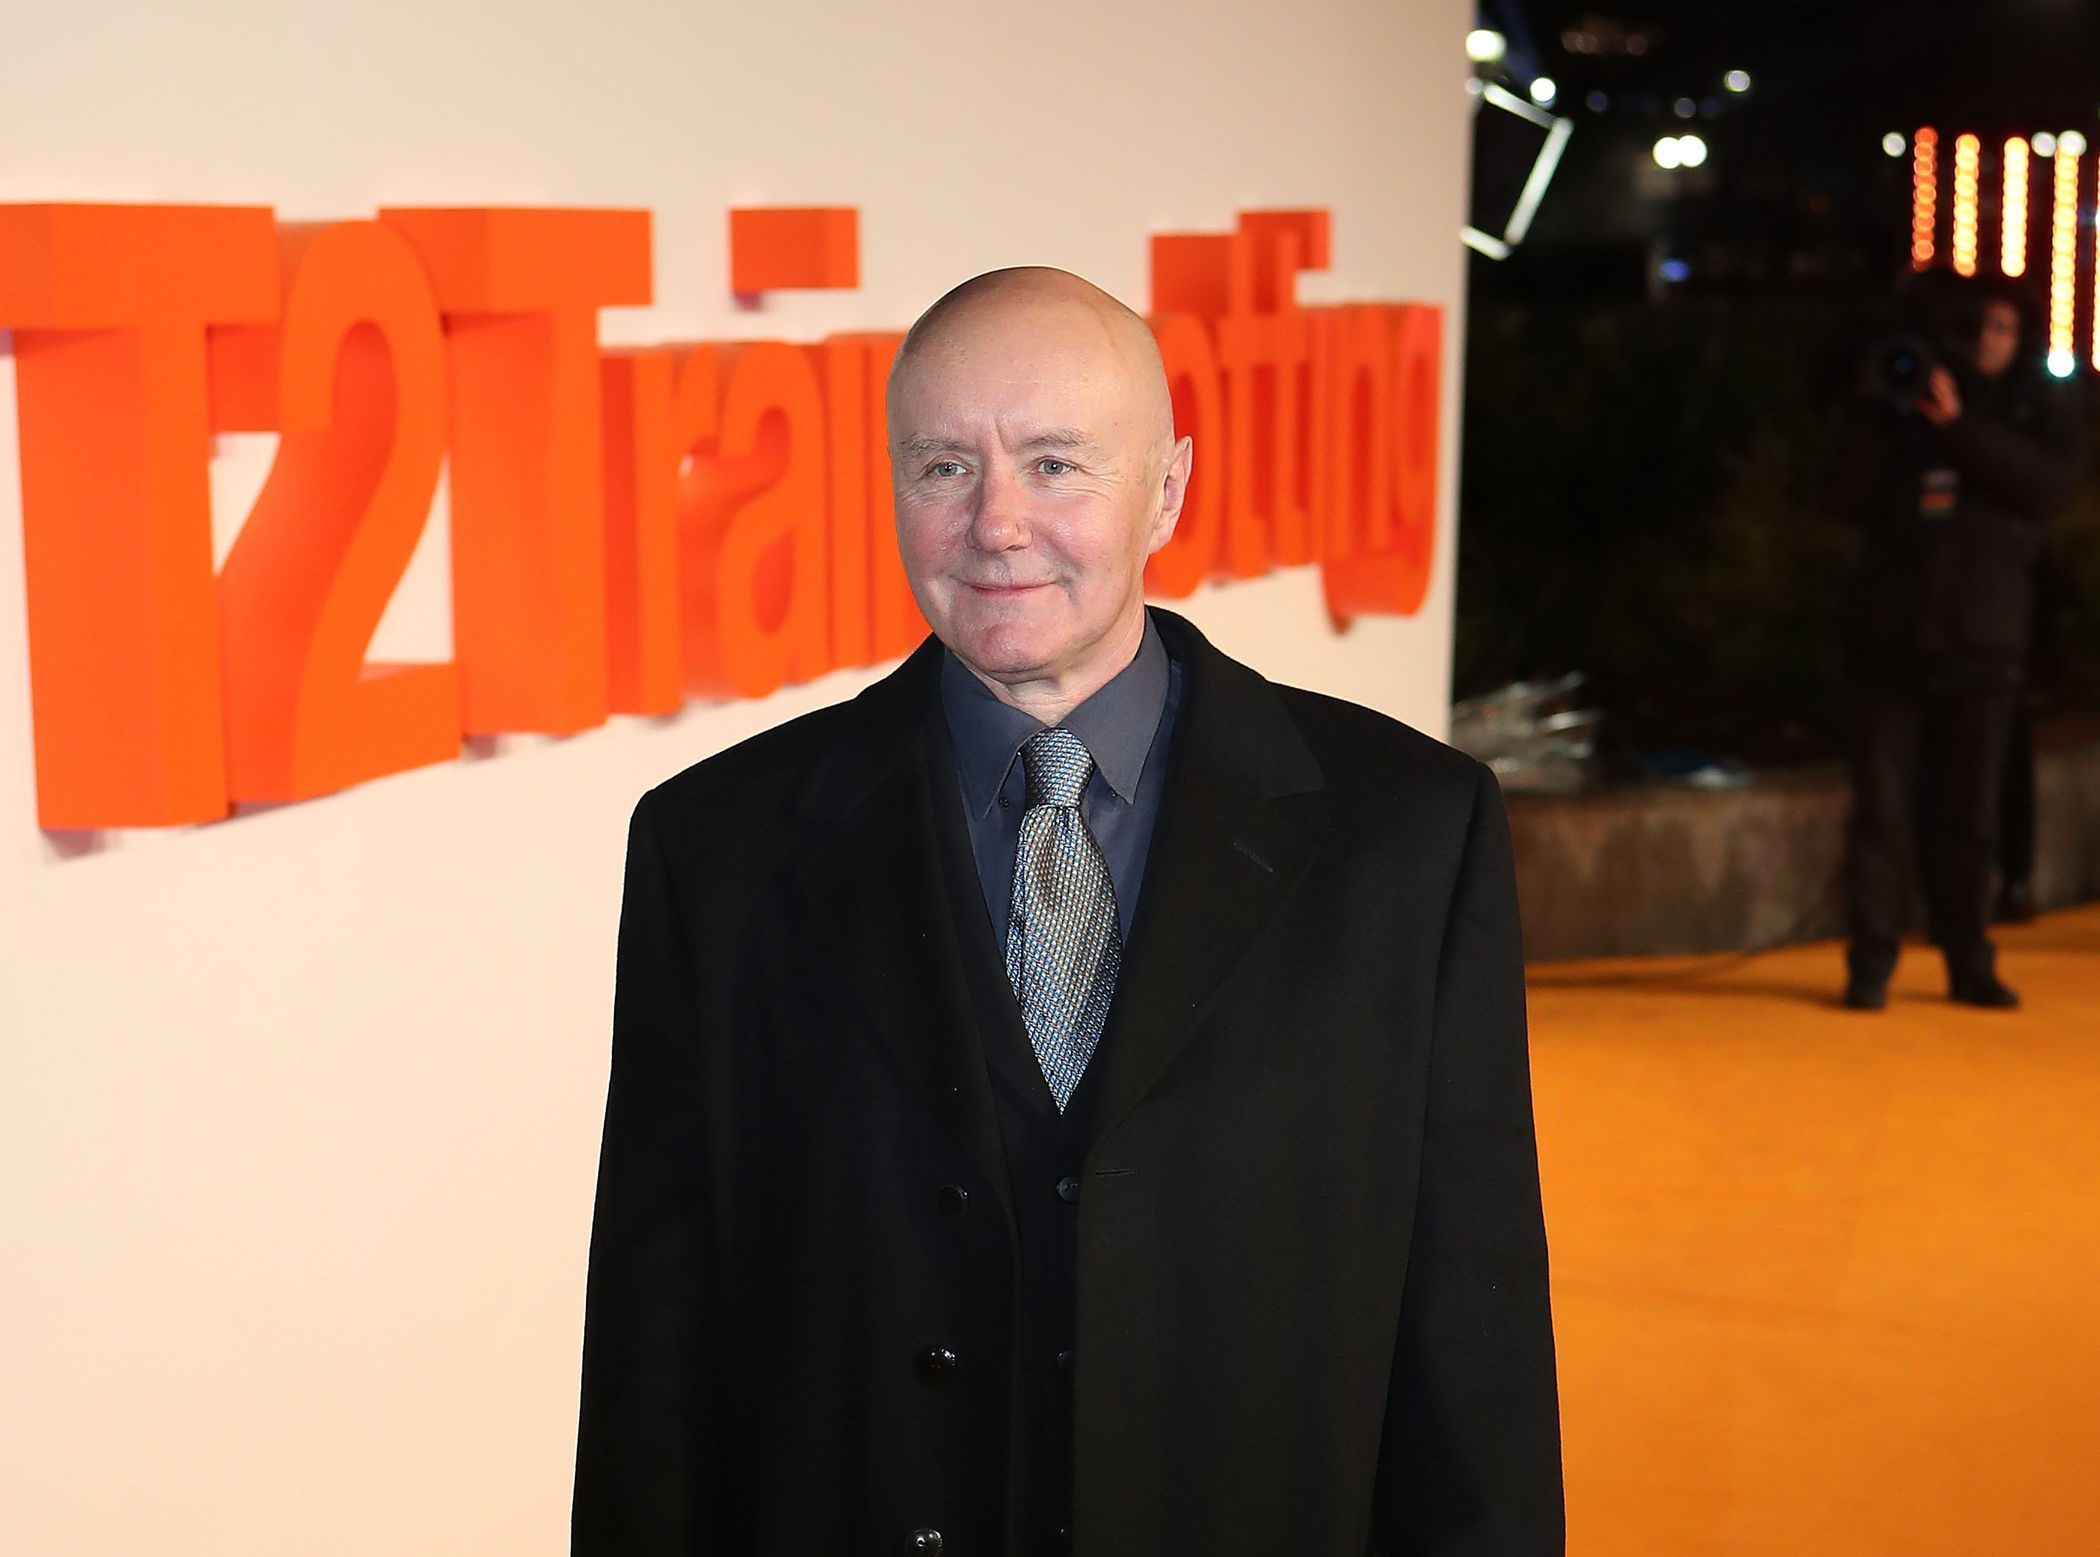 Irvine Welsh arriving at the world premiere of Trainspotting 2